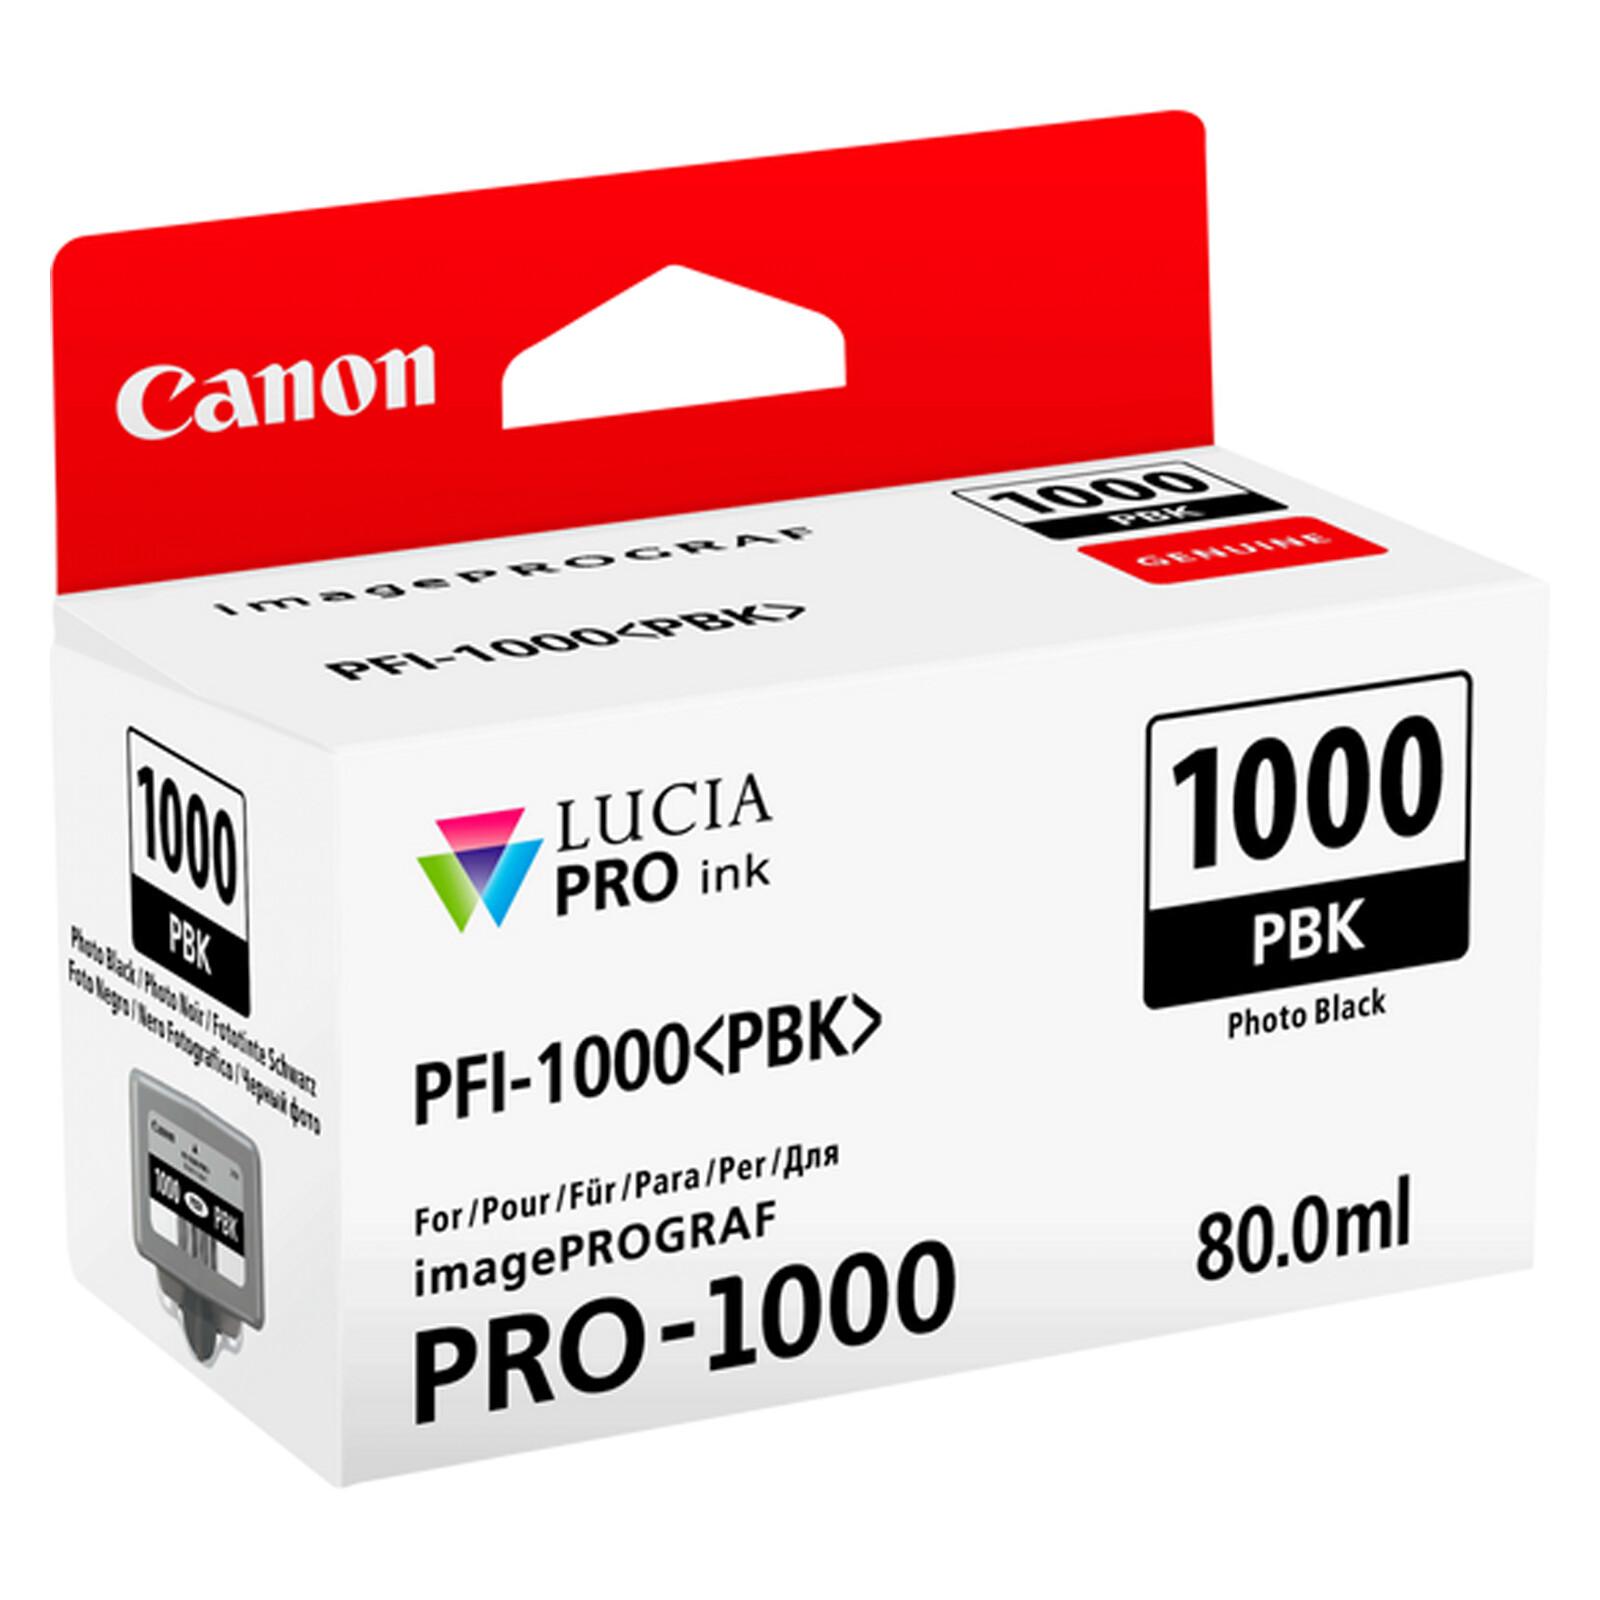 Canon PFI1000PBK photo black imagePrograf Pro 1000